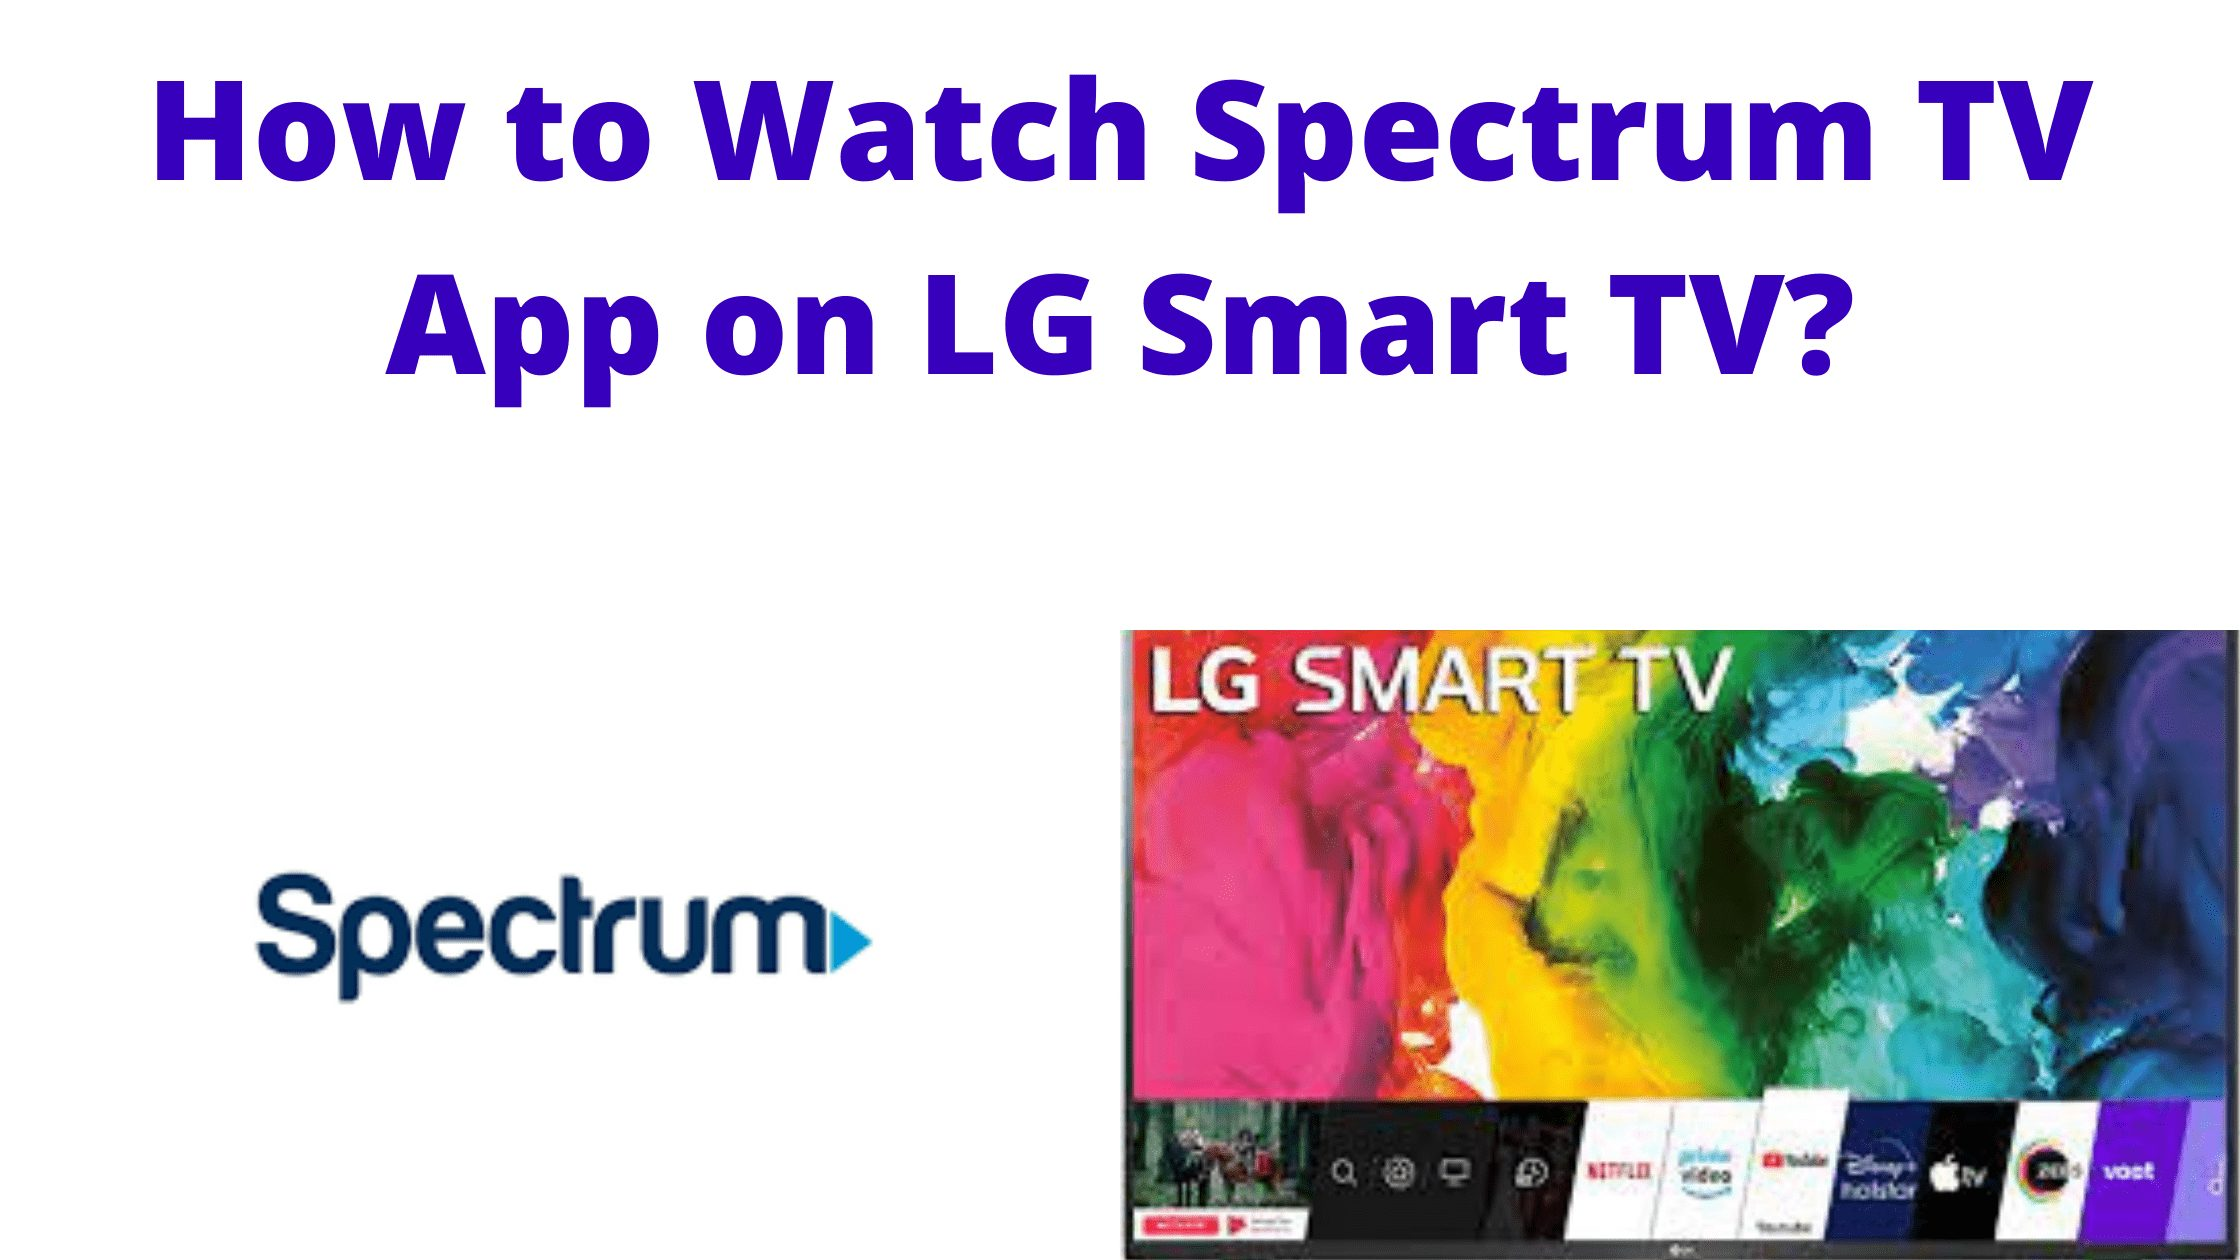 Spectrum App on LG Smart TV